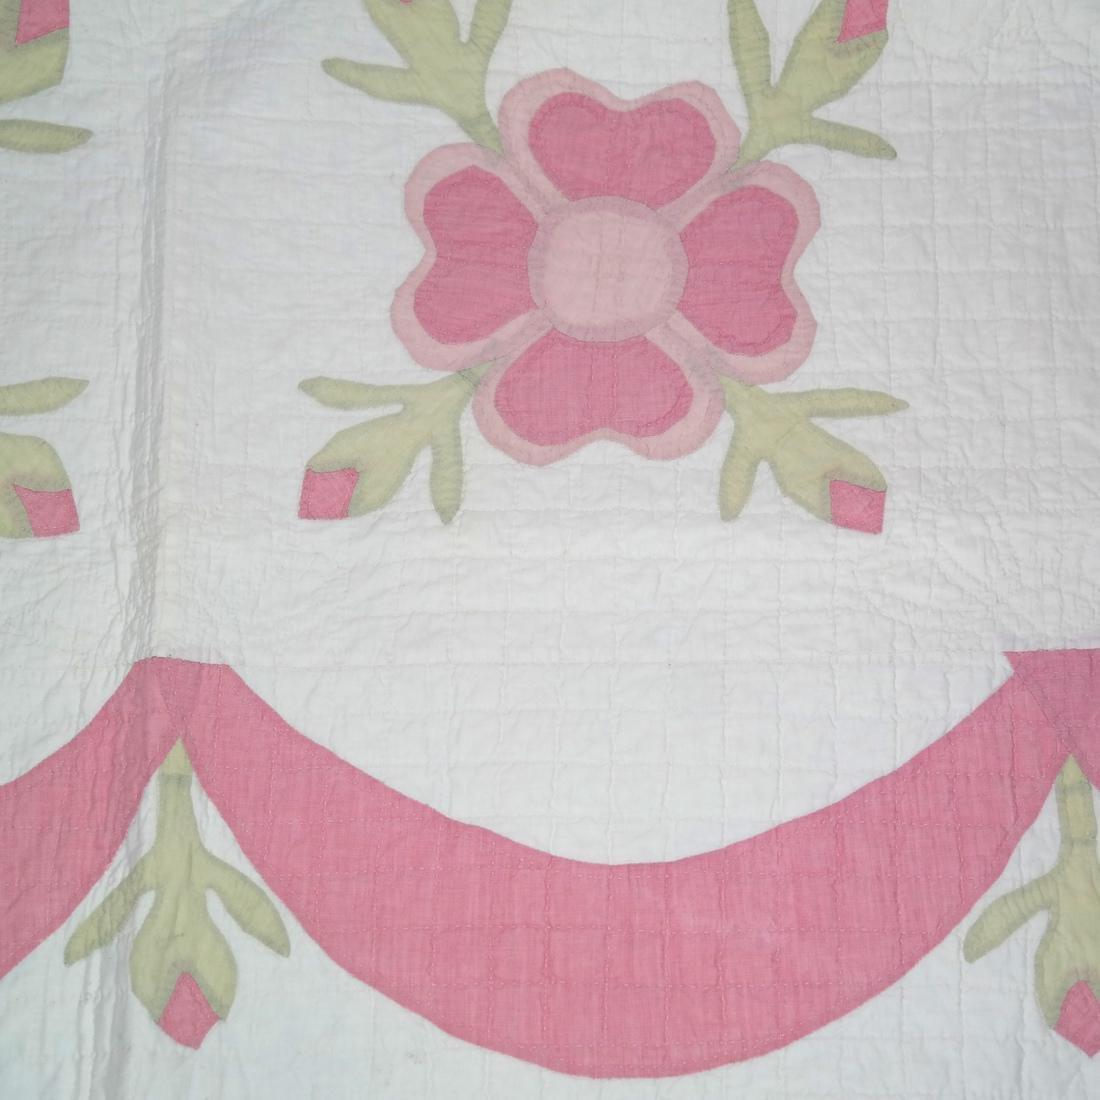 Quilt, Rose of Sharon, c. 1930 - 3